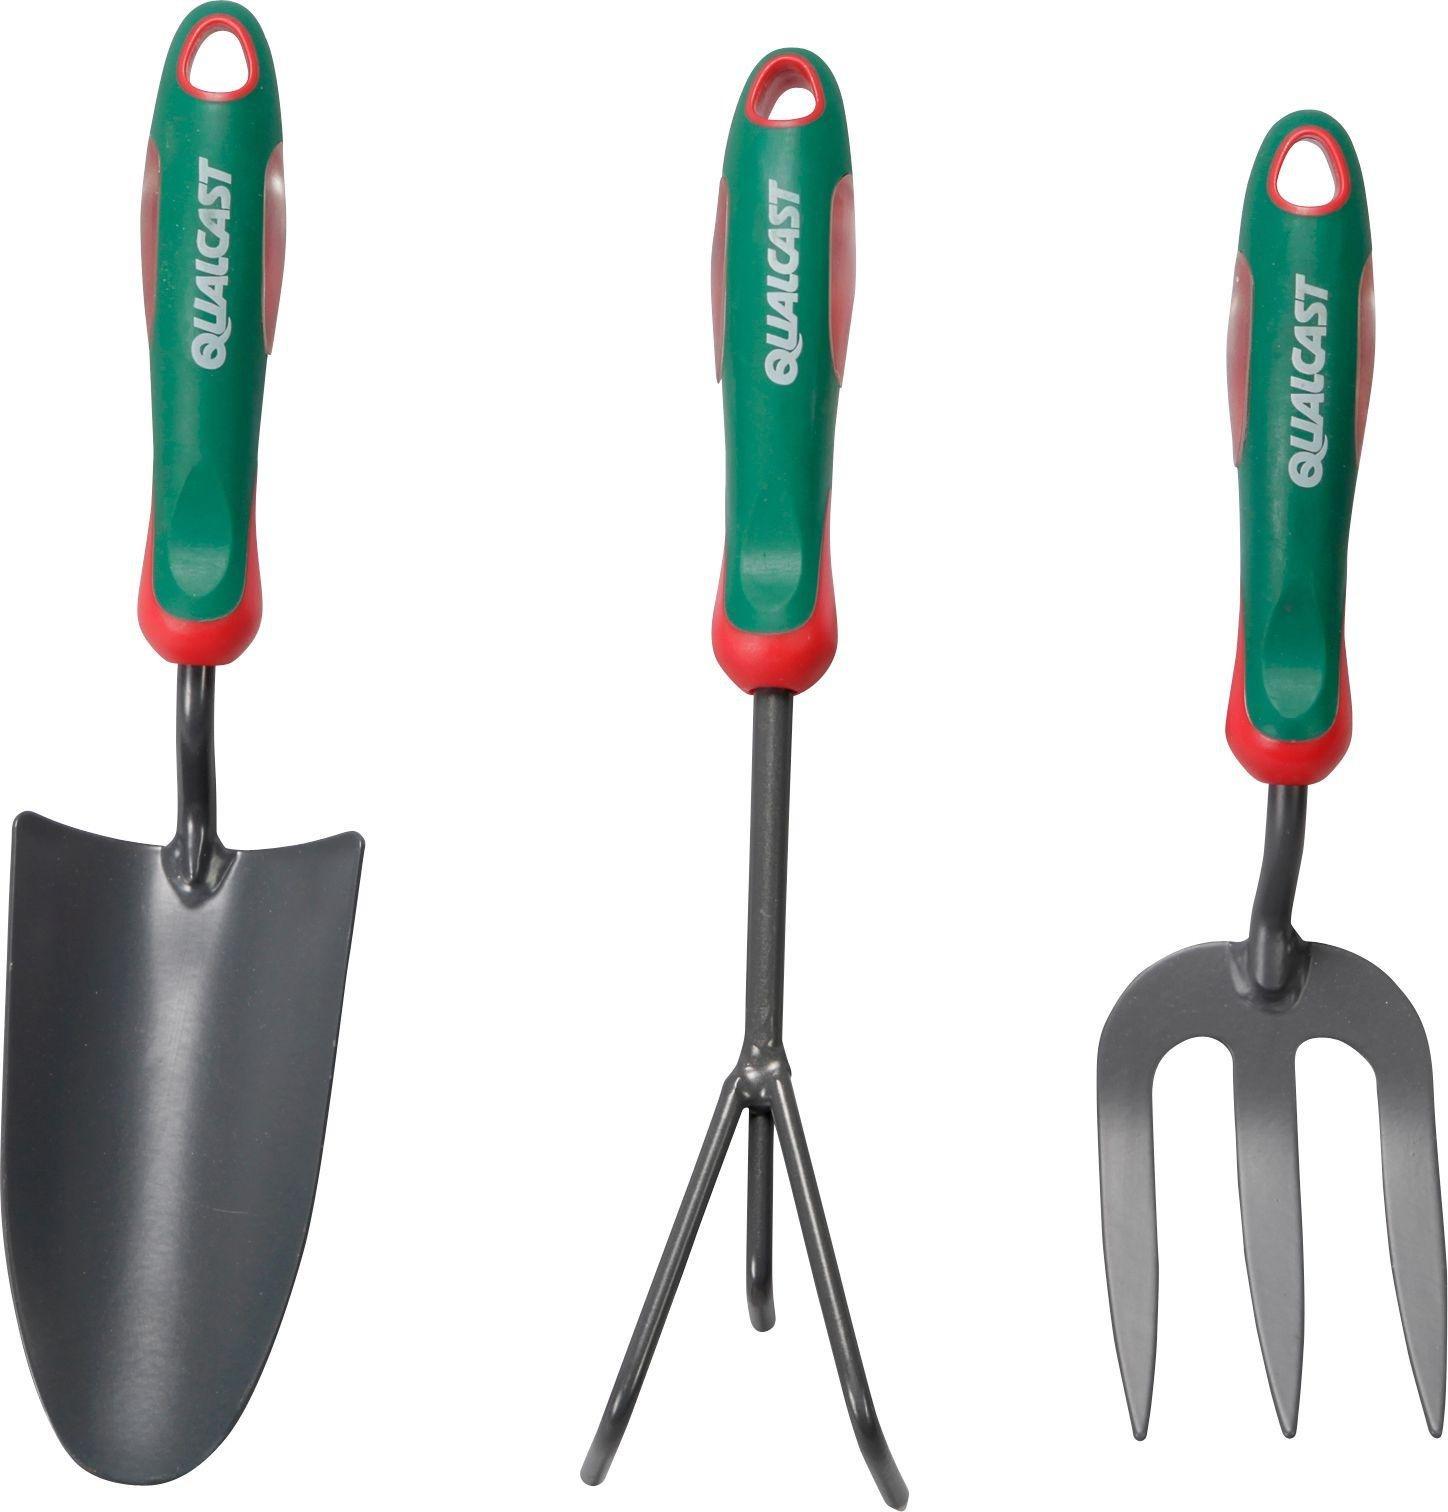 Buy Qualcast Garden 3 Piece Hand Tools Set at Argoscouk Your